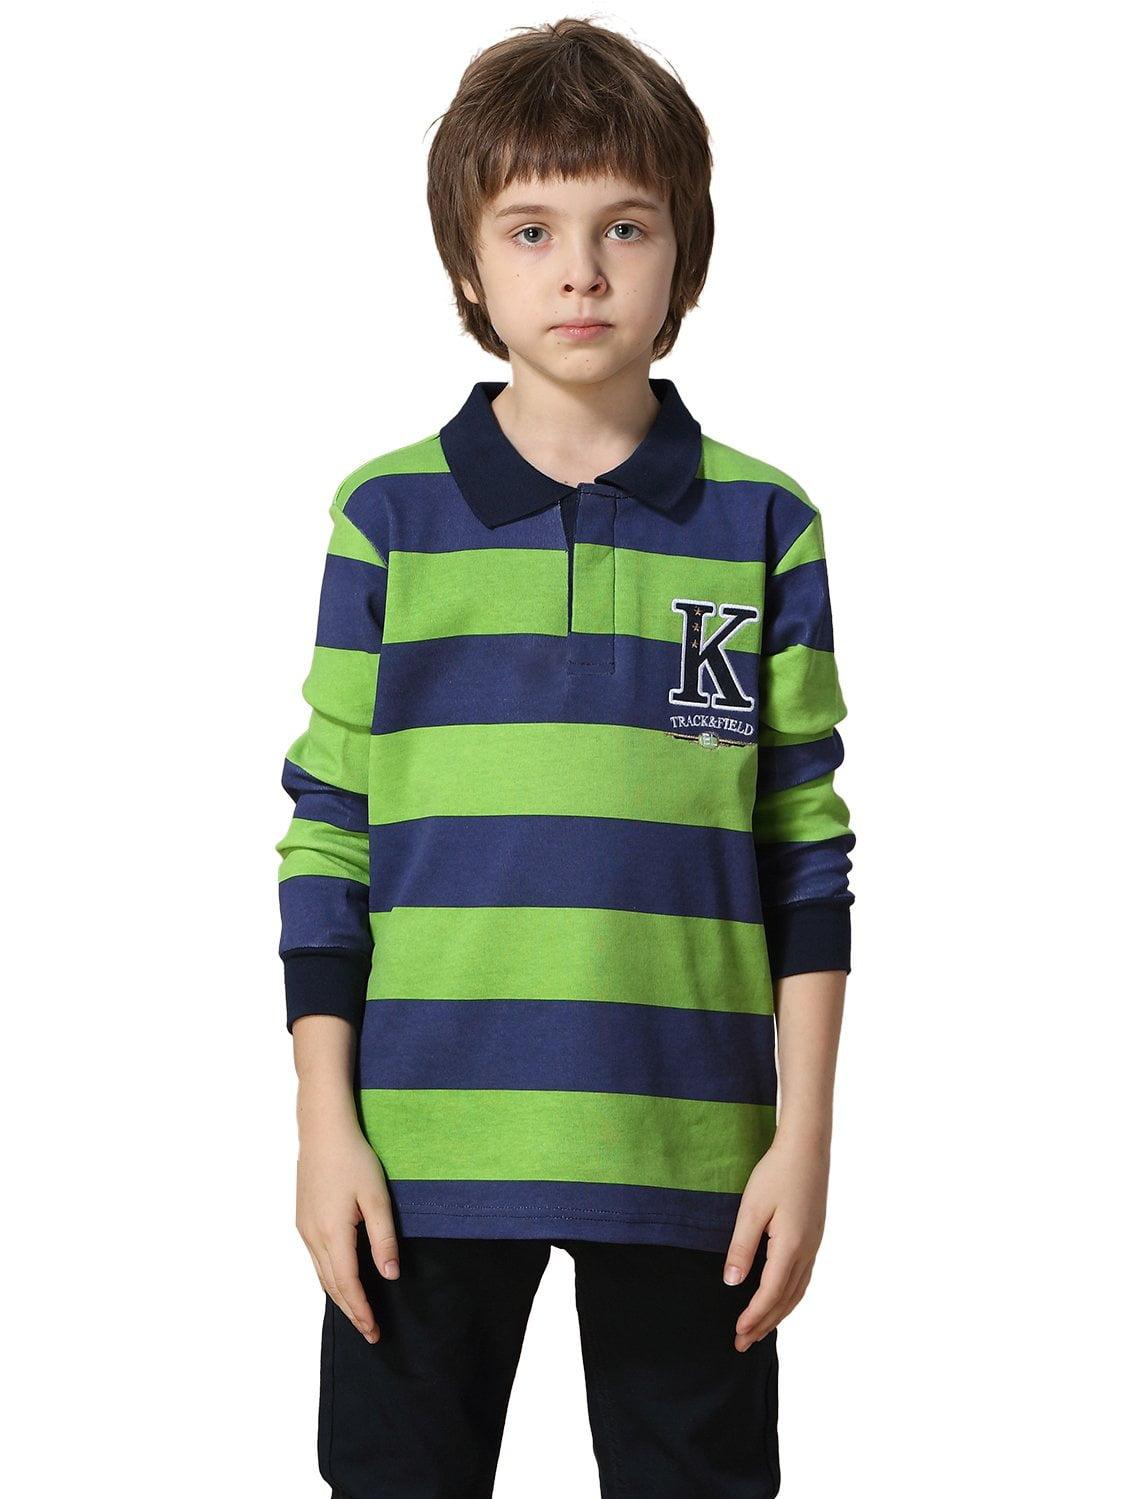 Leo&Lily Big Boys' Kids Yarn Dyed Polo Shirts T-Shirt